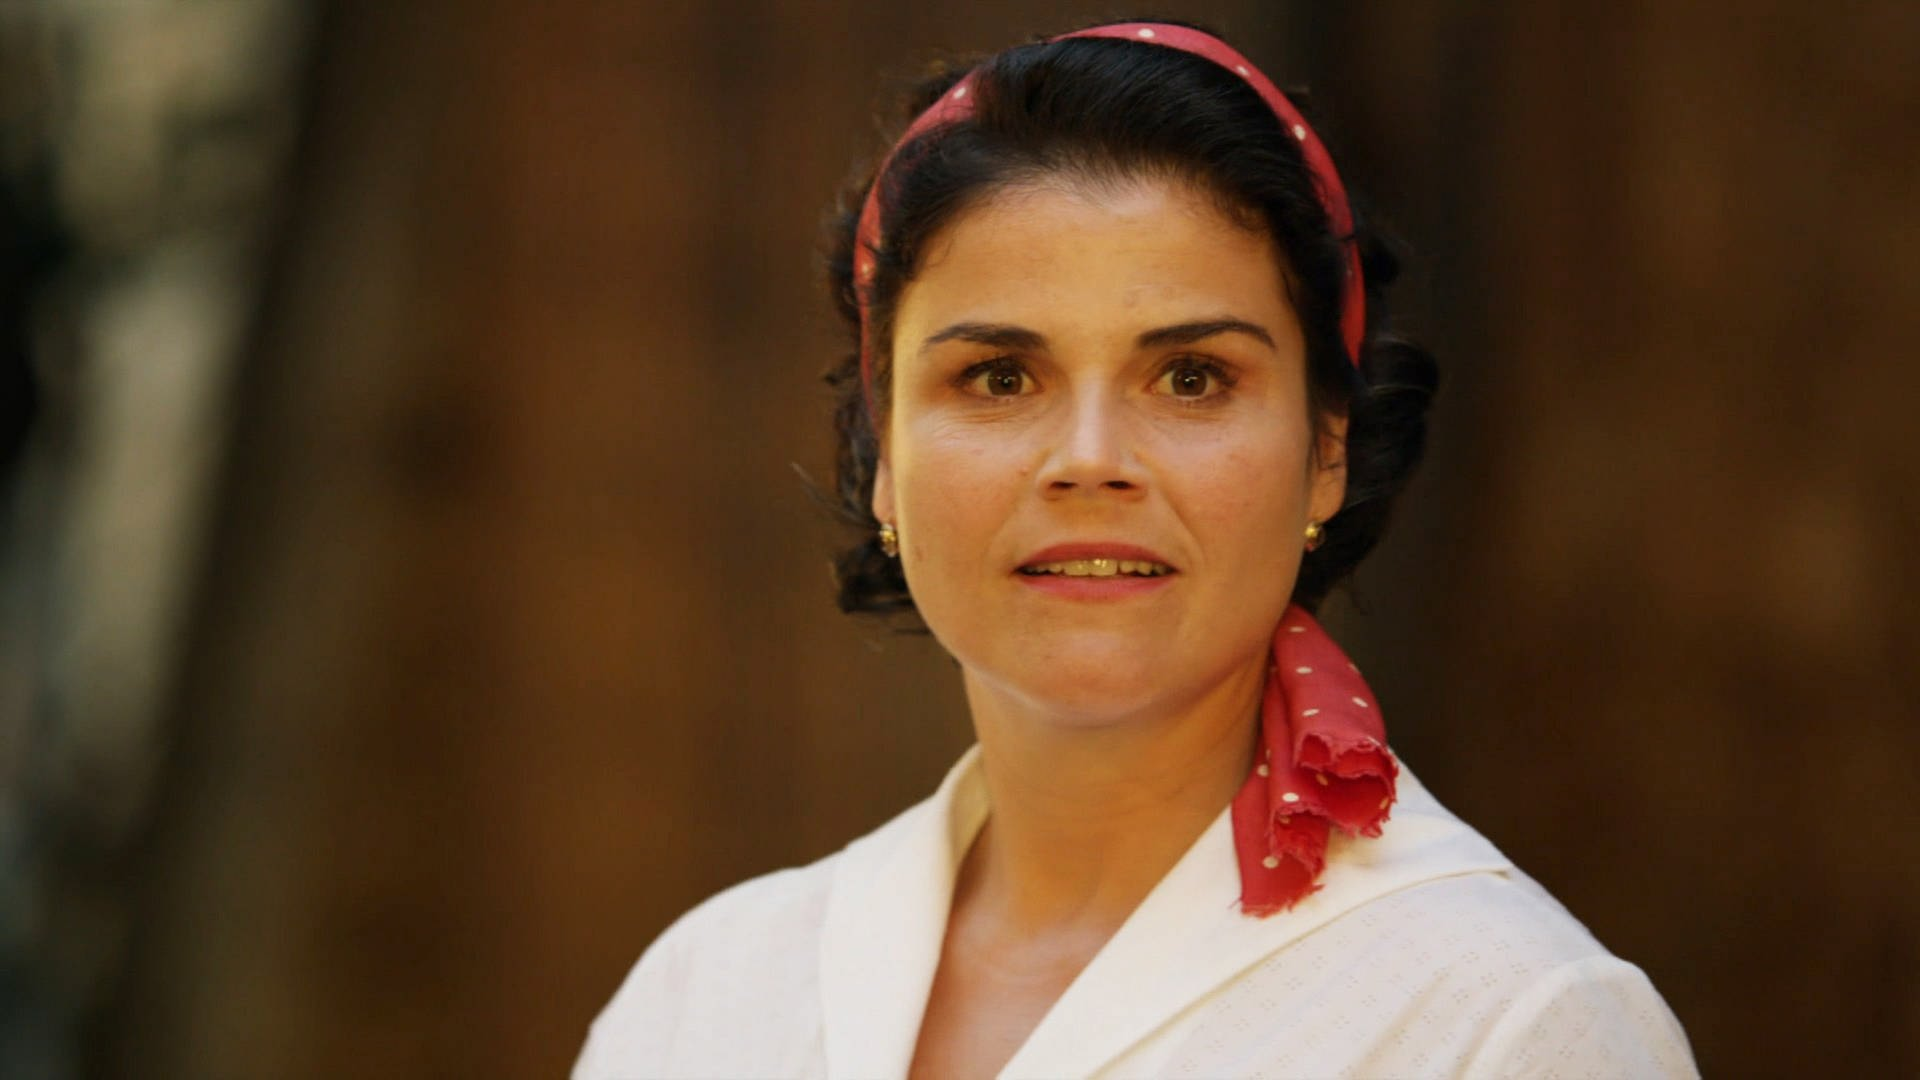 Schauspielerin Katharina Wackernagel nah - Szene aus ARD-Film Aenne Burda